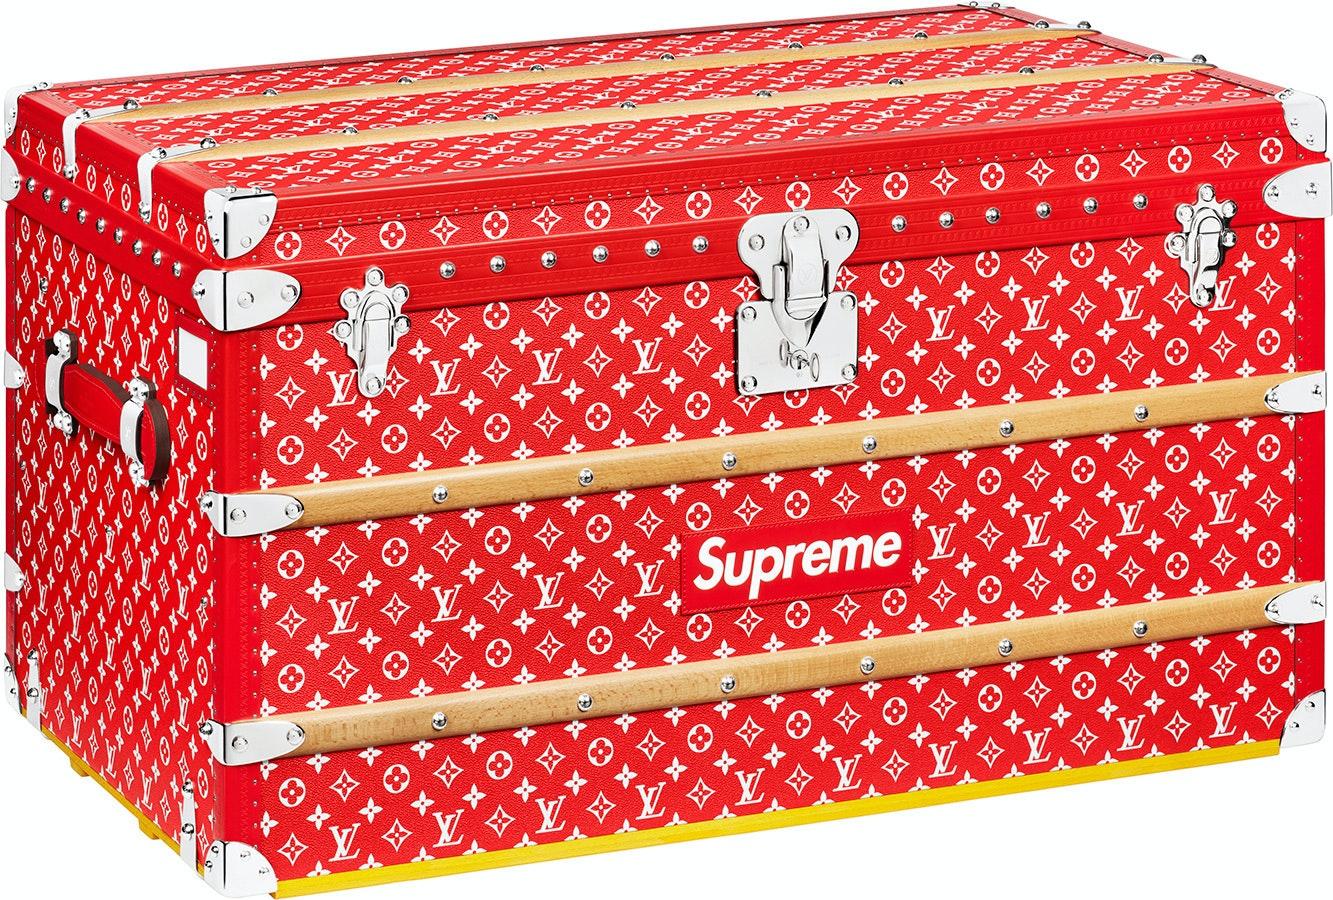 Louis Vuitton x Supreme Malle Courrier Trunk Monogram 90 Red